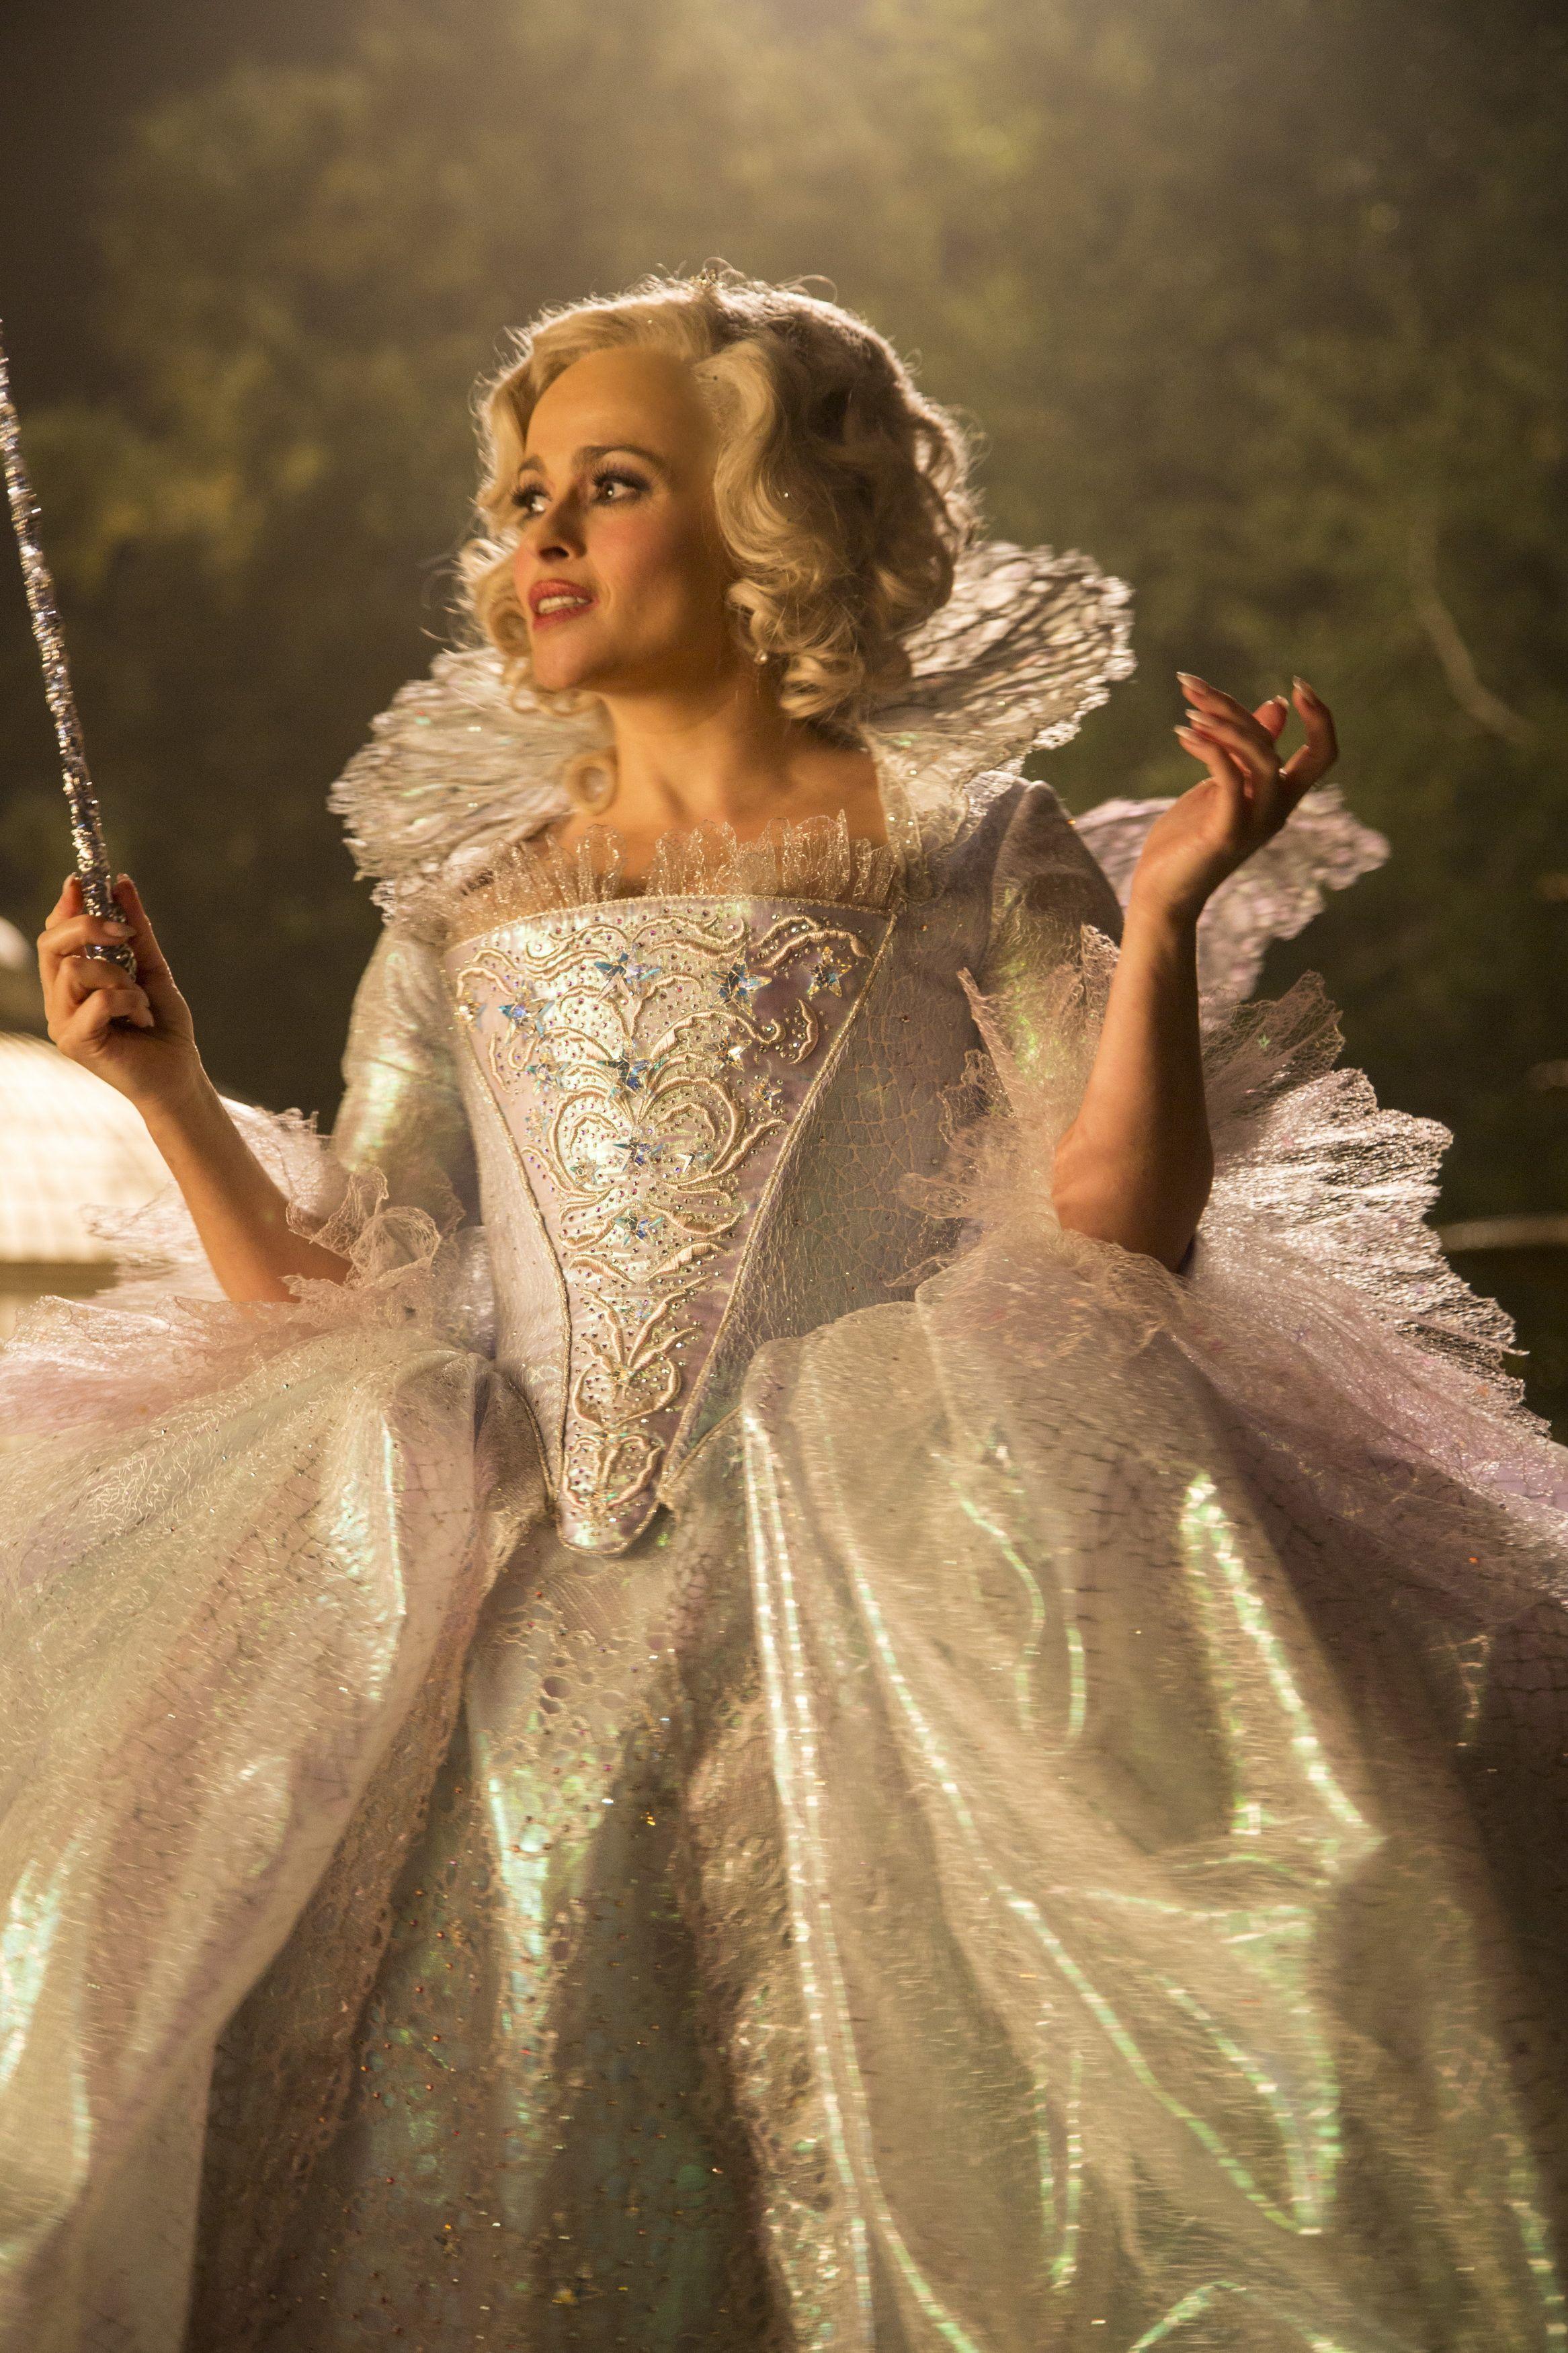 Cinderella 2015 51 Jpg Obrazek Jpeg 2333 3500 Pikseli Skala 26 Cinderella Costume Cinderella Movie Cinderella Fairy Godmother